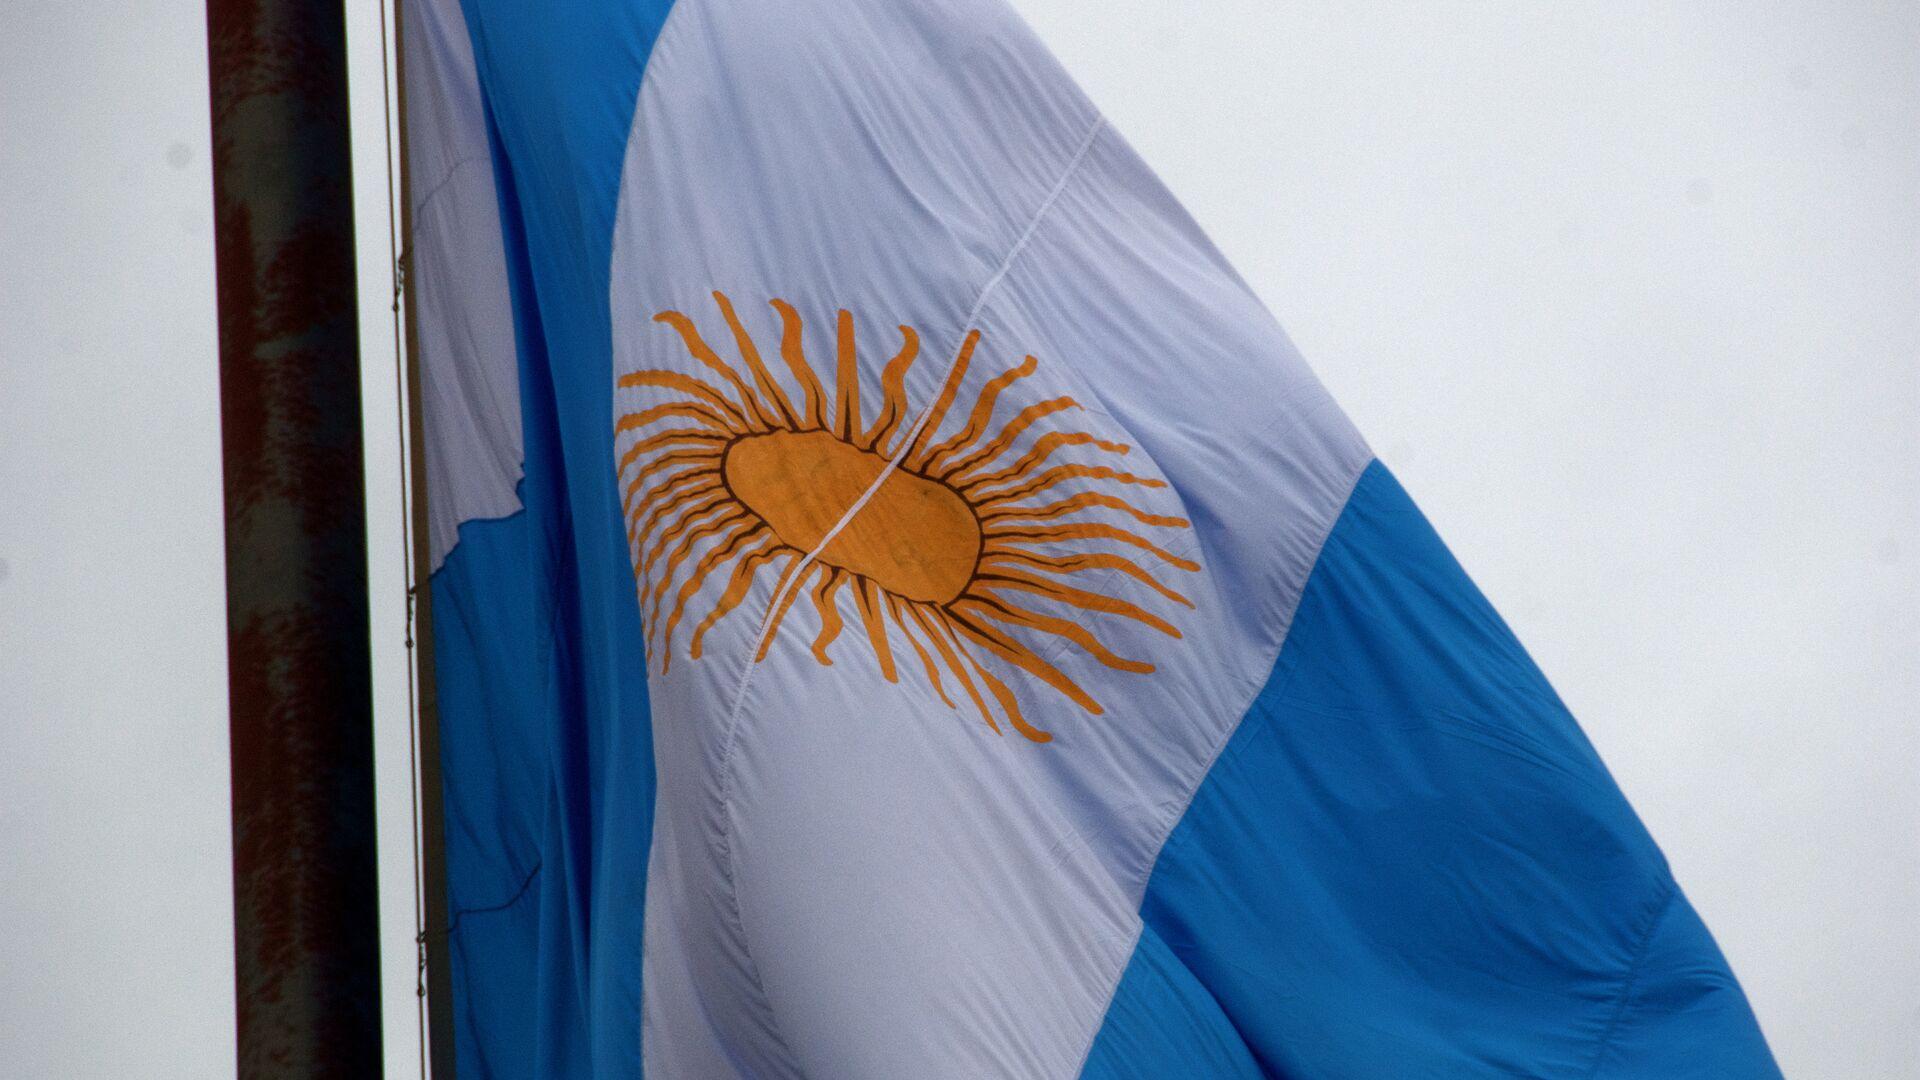 Bandera de Argentina - Sputnik Mundo, 1920, 24.07.2021